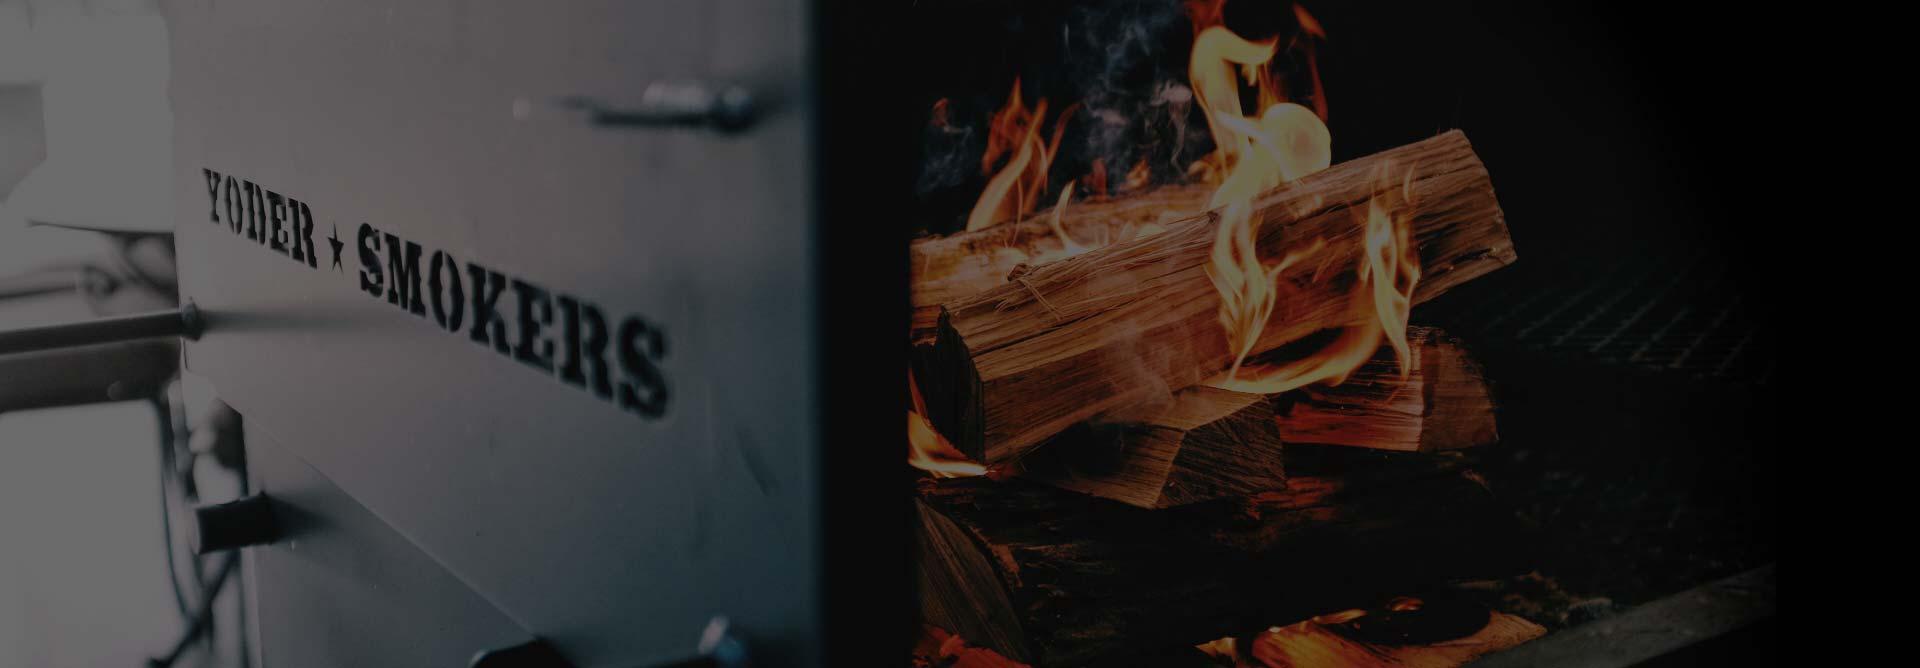 grills header bg